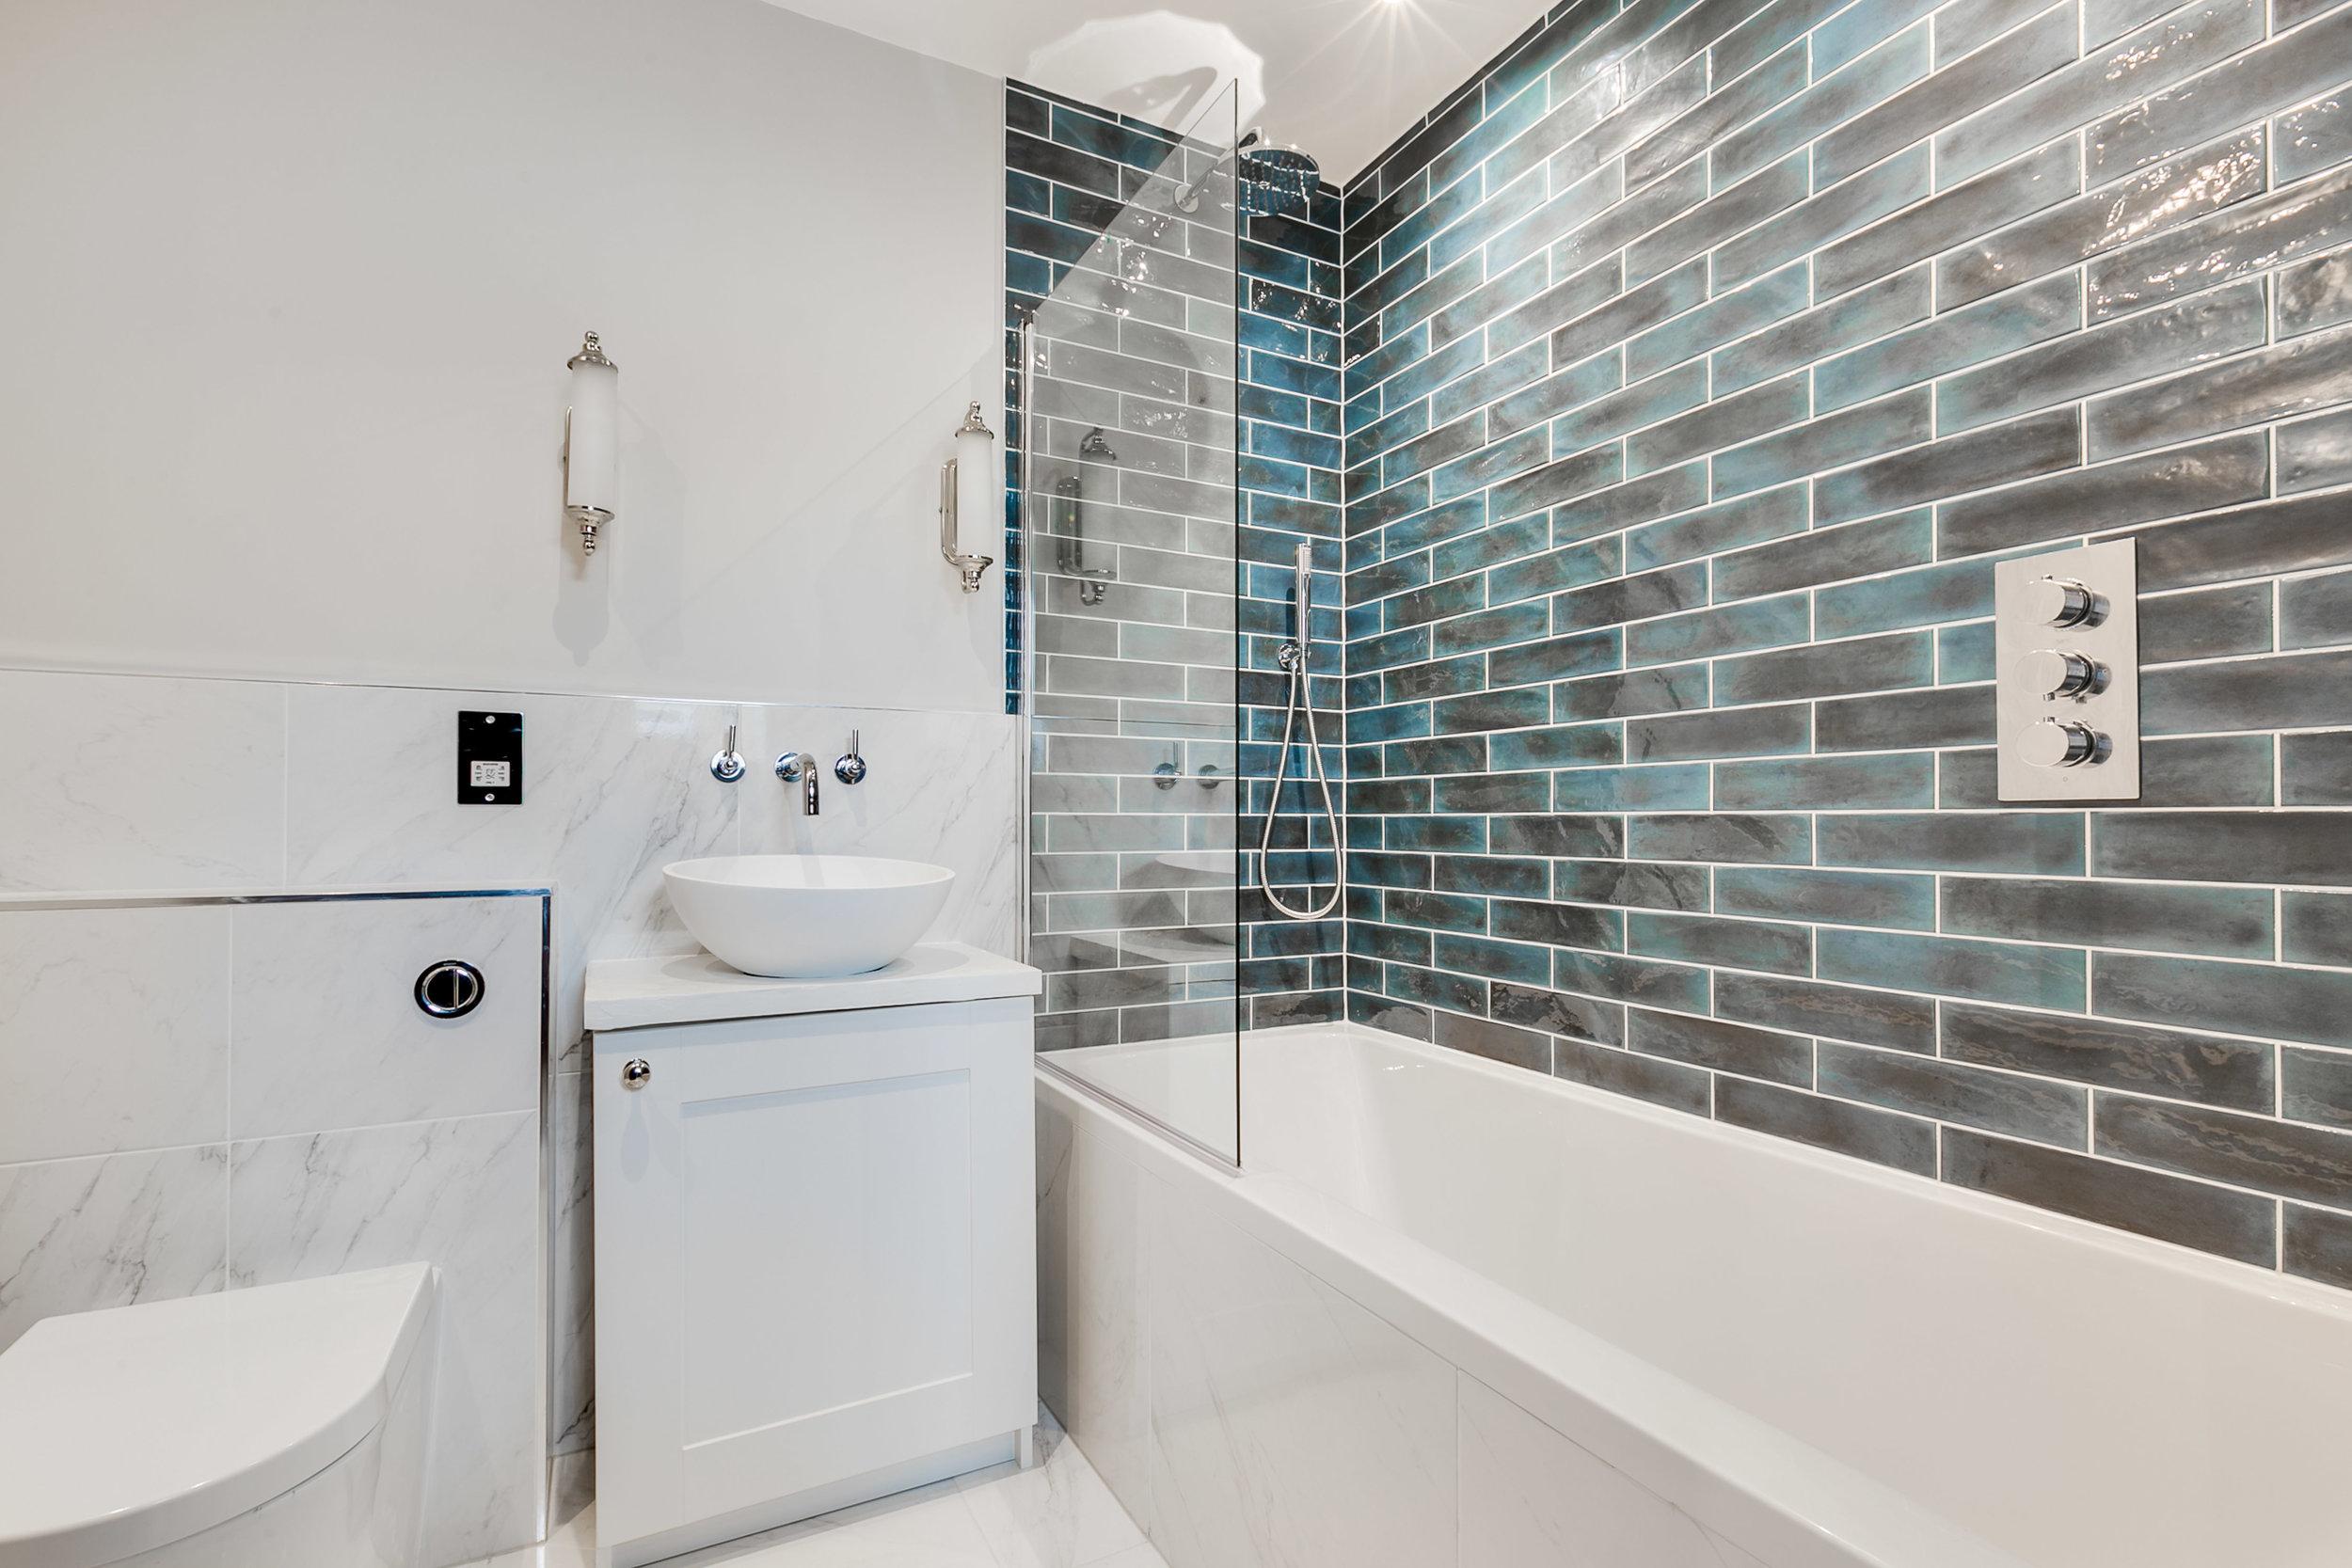 B_Bathroom 1.jpg